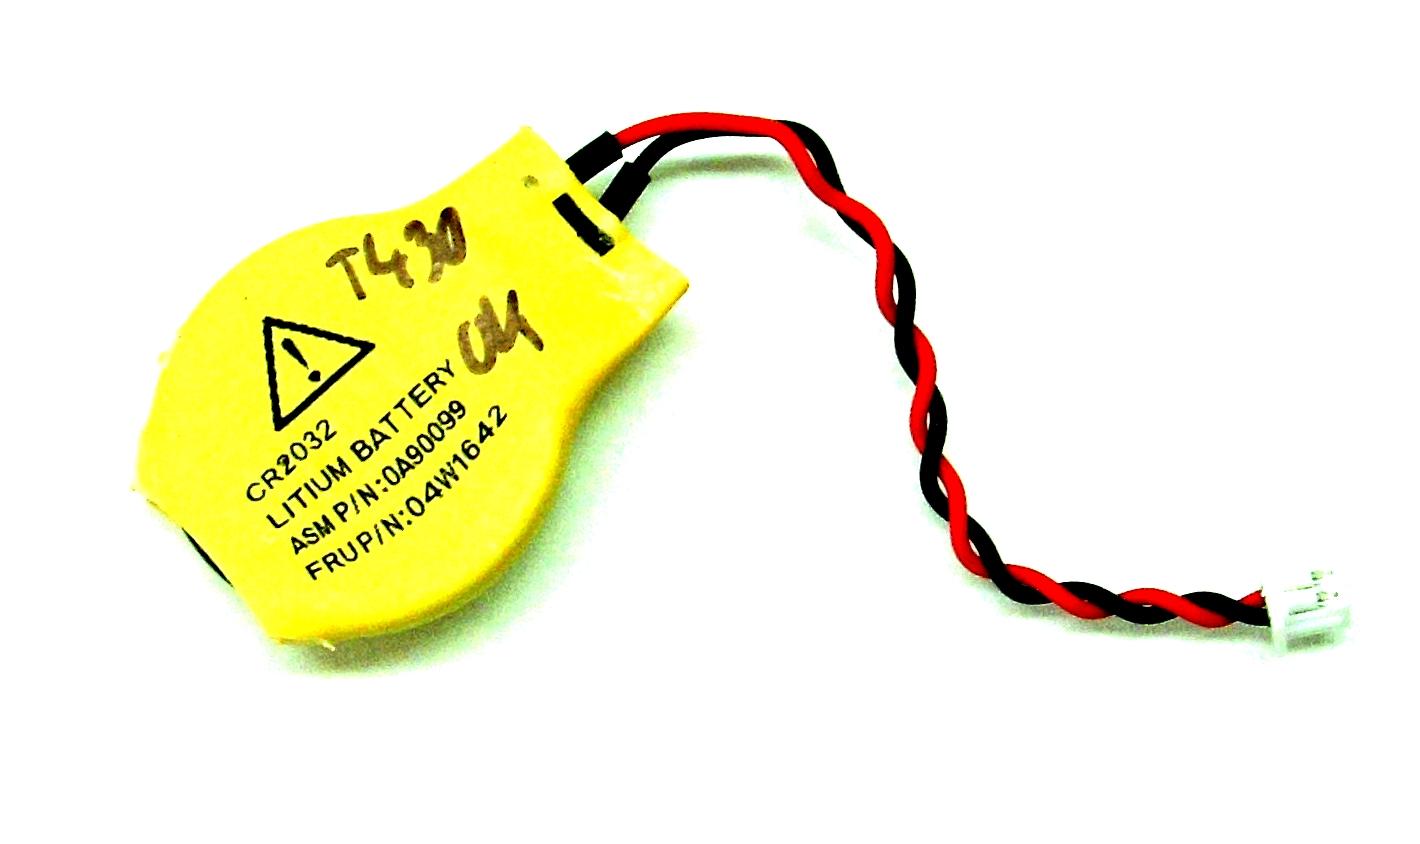 Bateria CMOS BIOS LENOVO T430 T430i T420 T440 - 7382202953